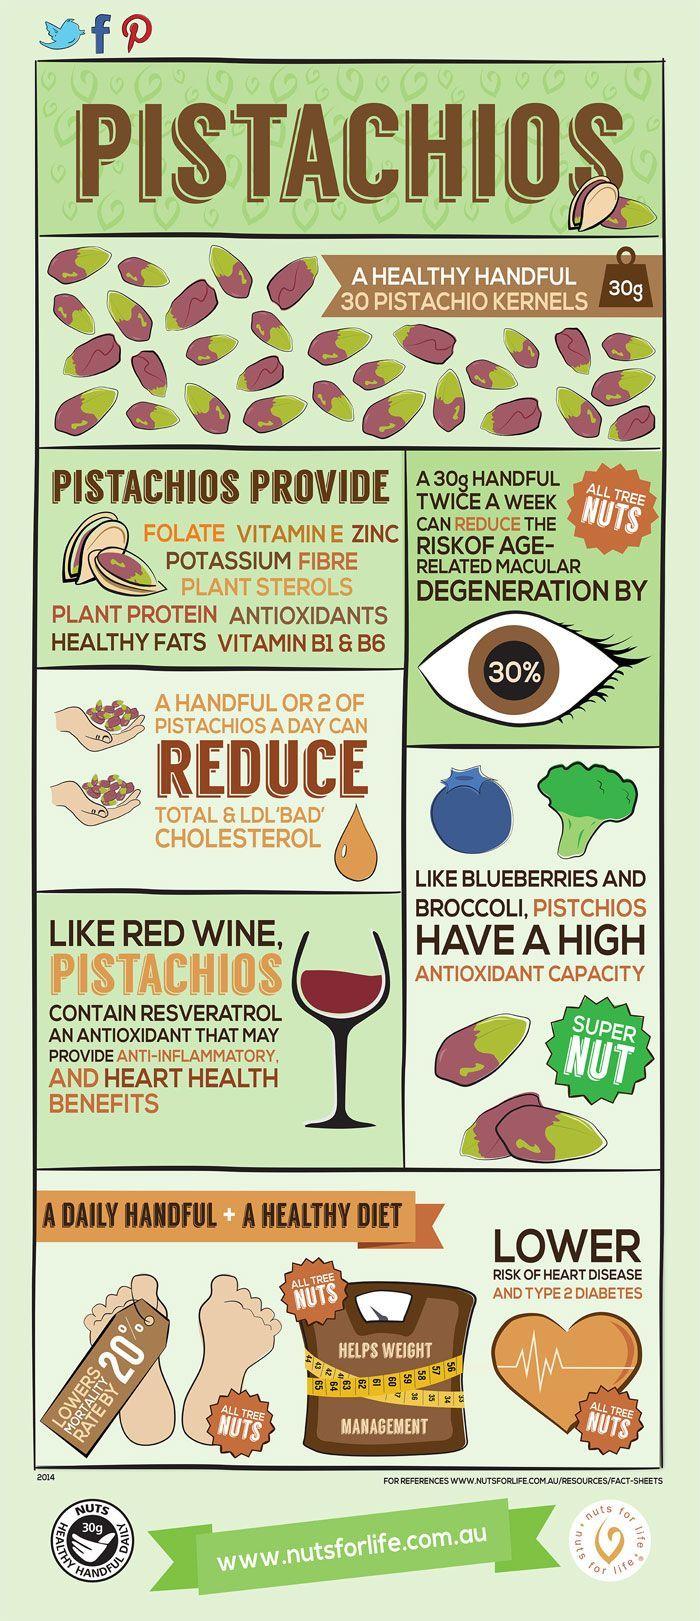 Pistachio Health Benefits! #healthy #folate #cholesterol